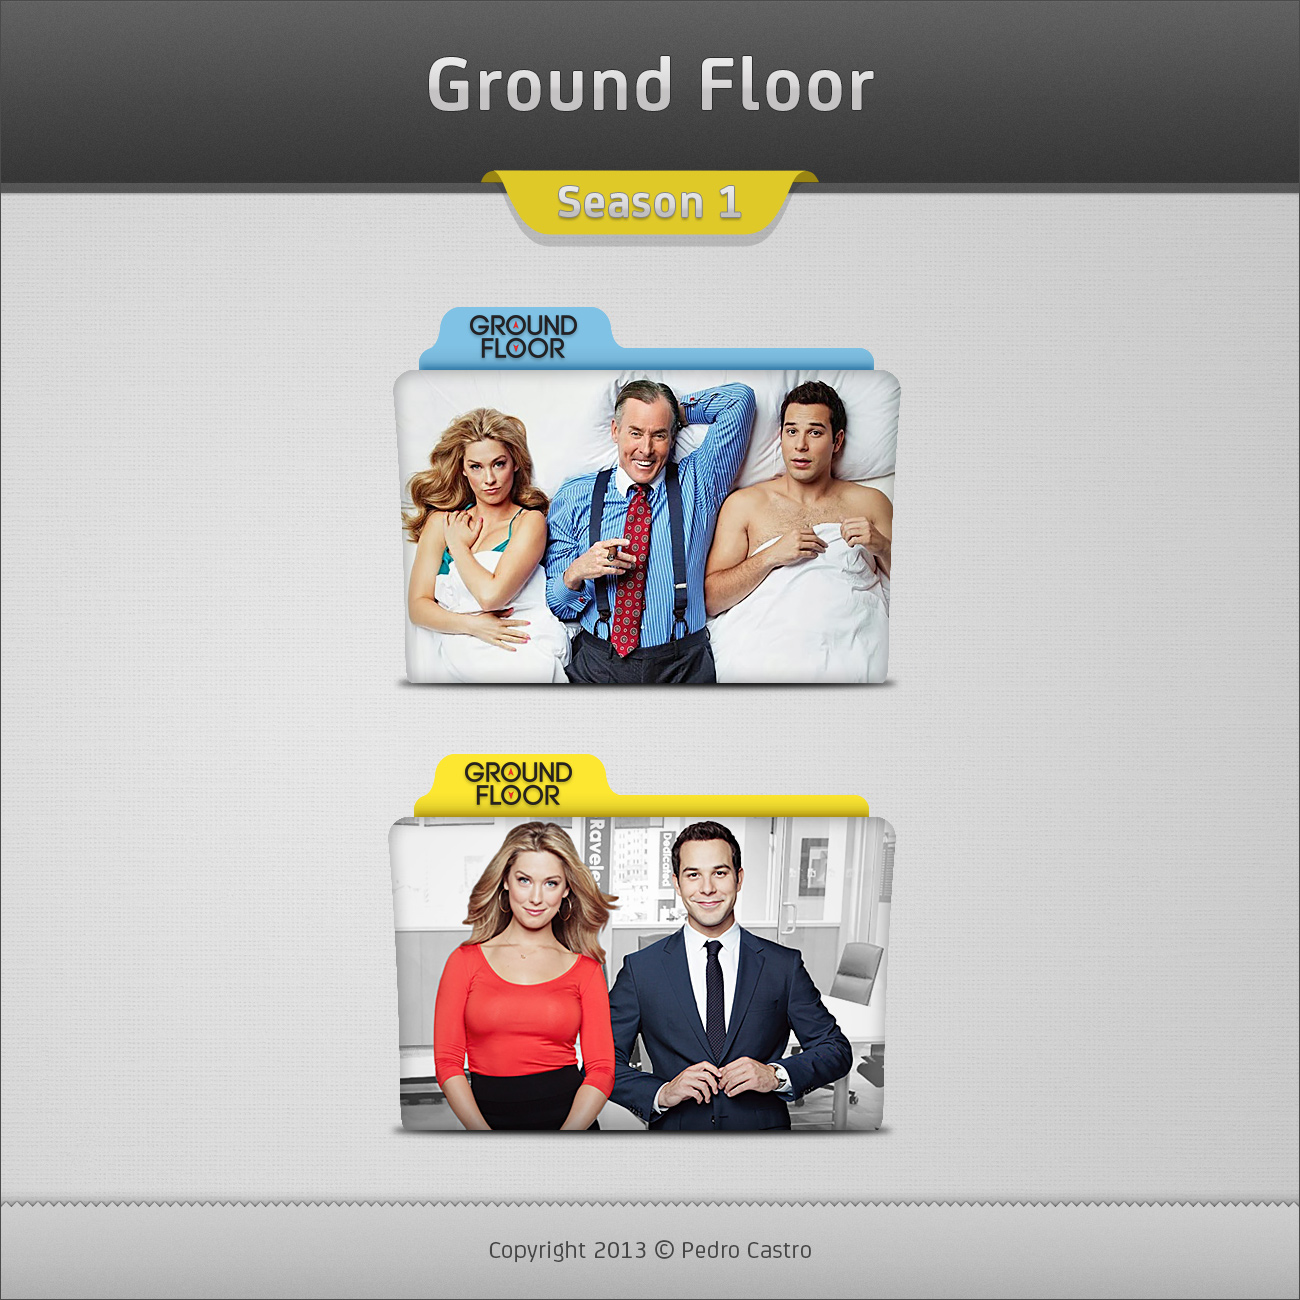 Ground Floor Season 1 By Pedrocastro